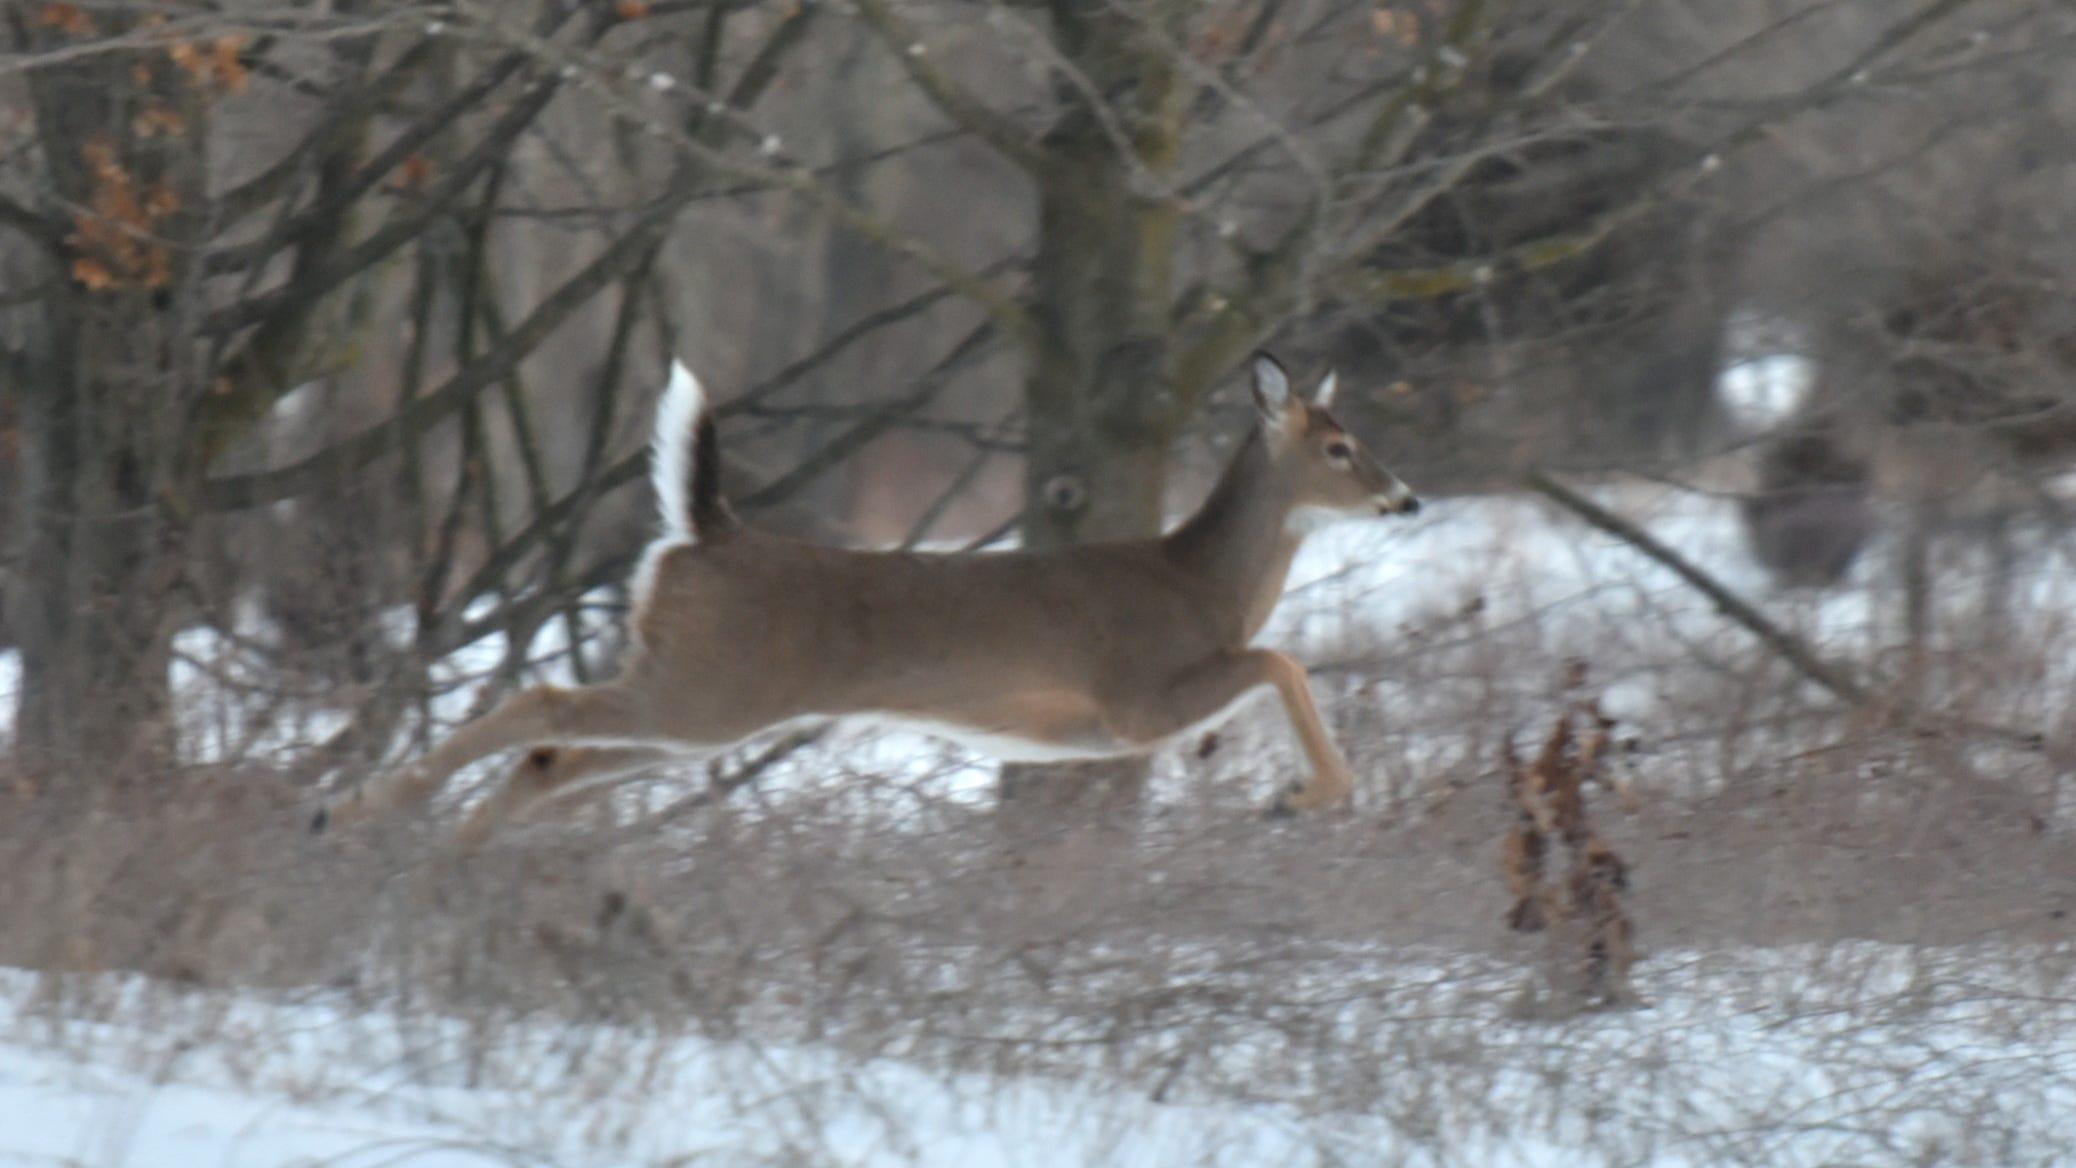 Threats of violence canceled Kensington deer cull